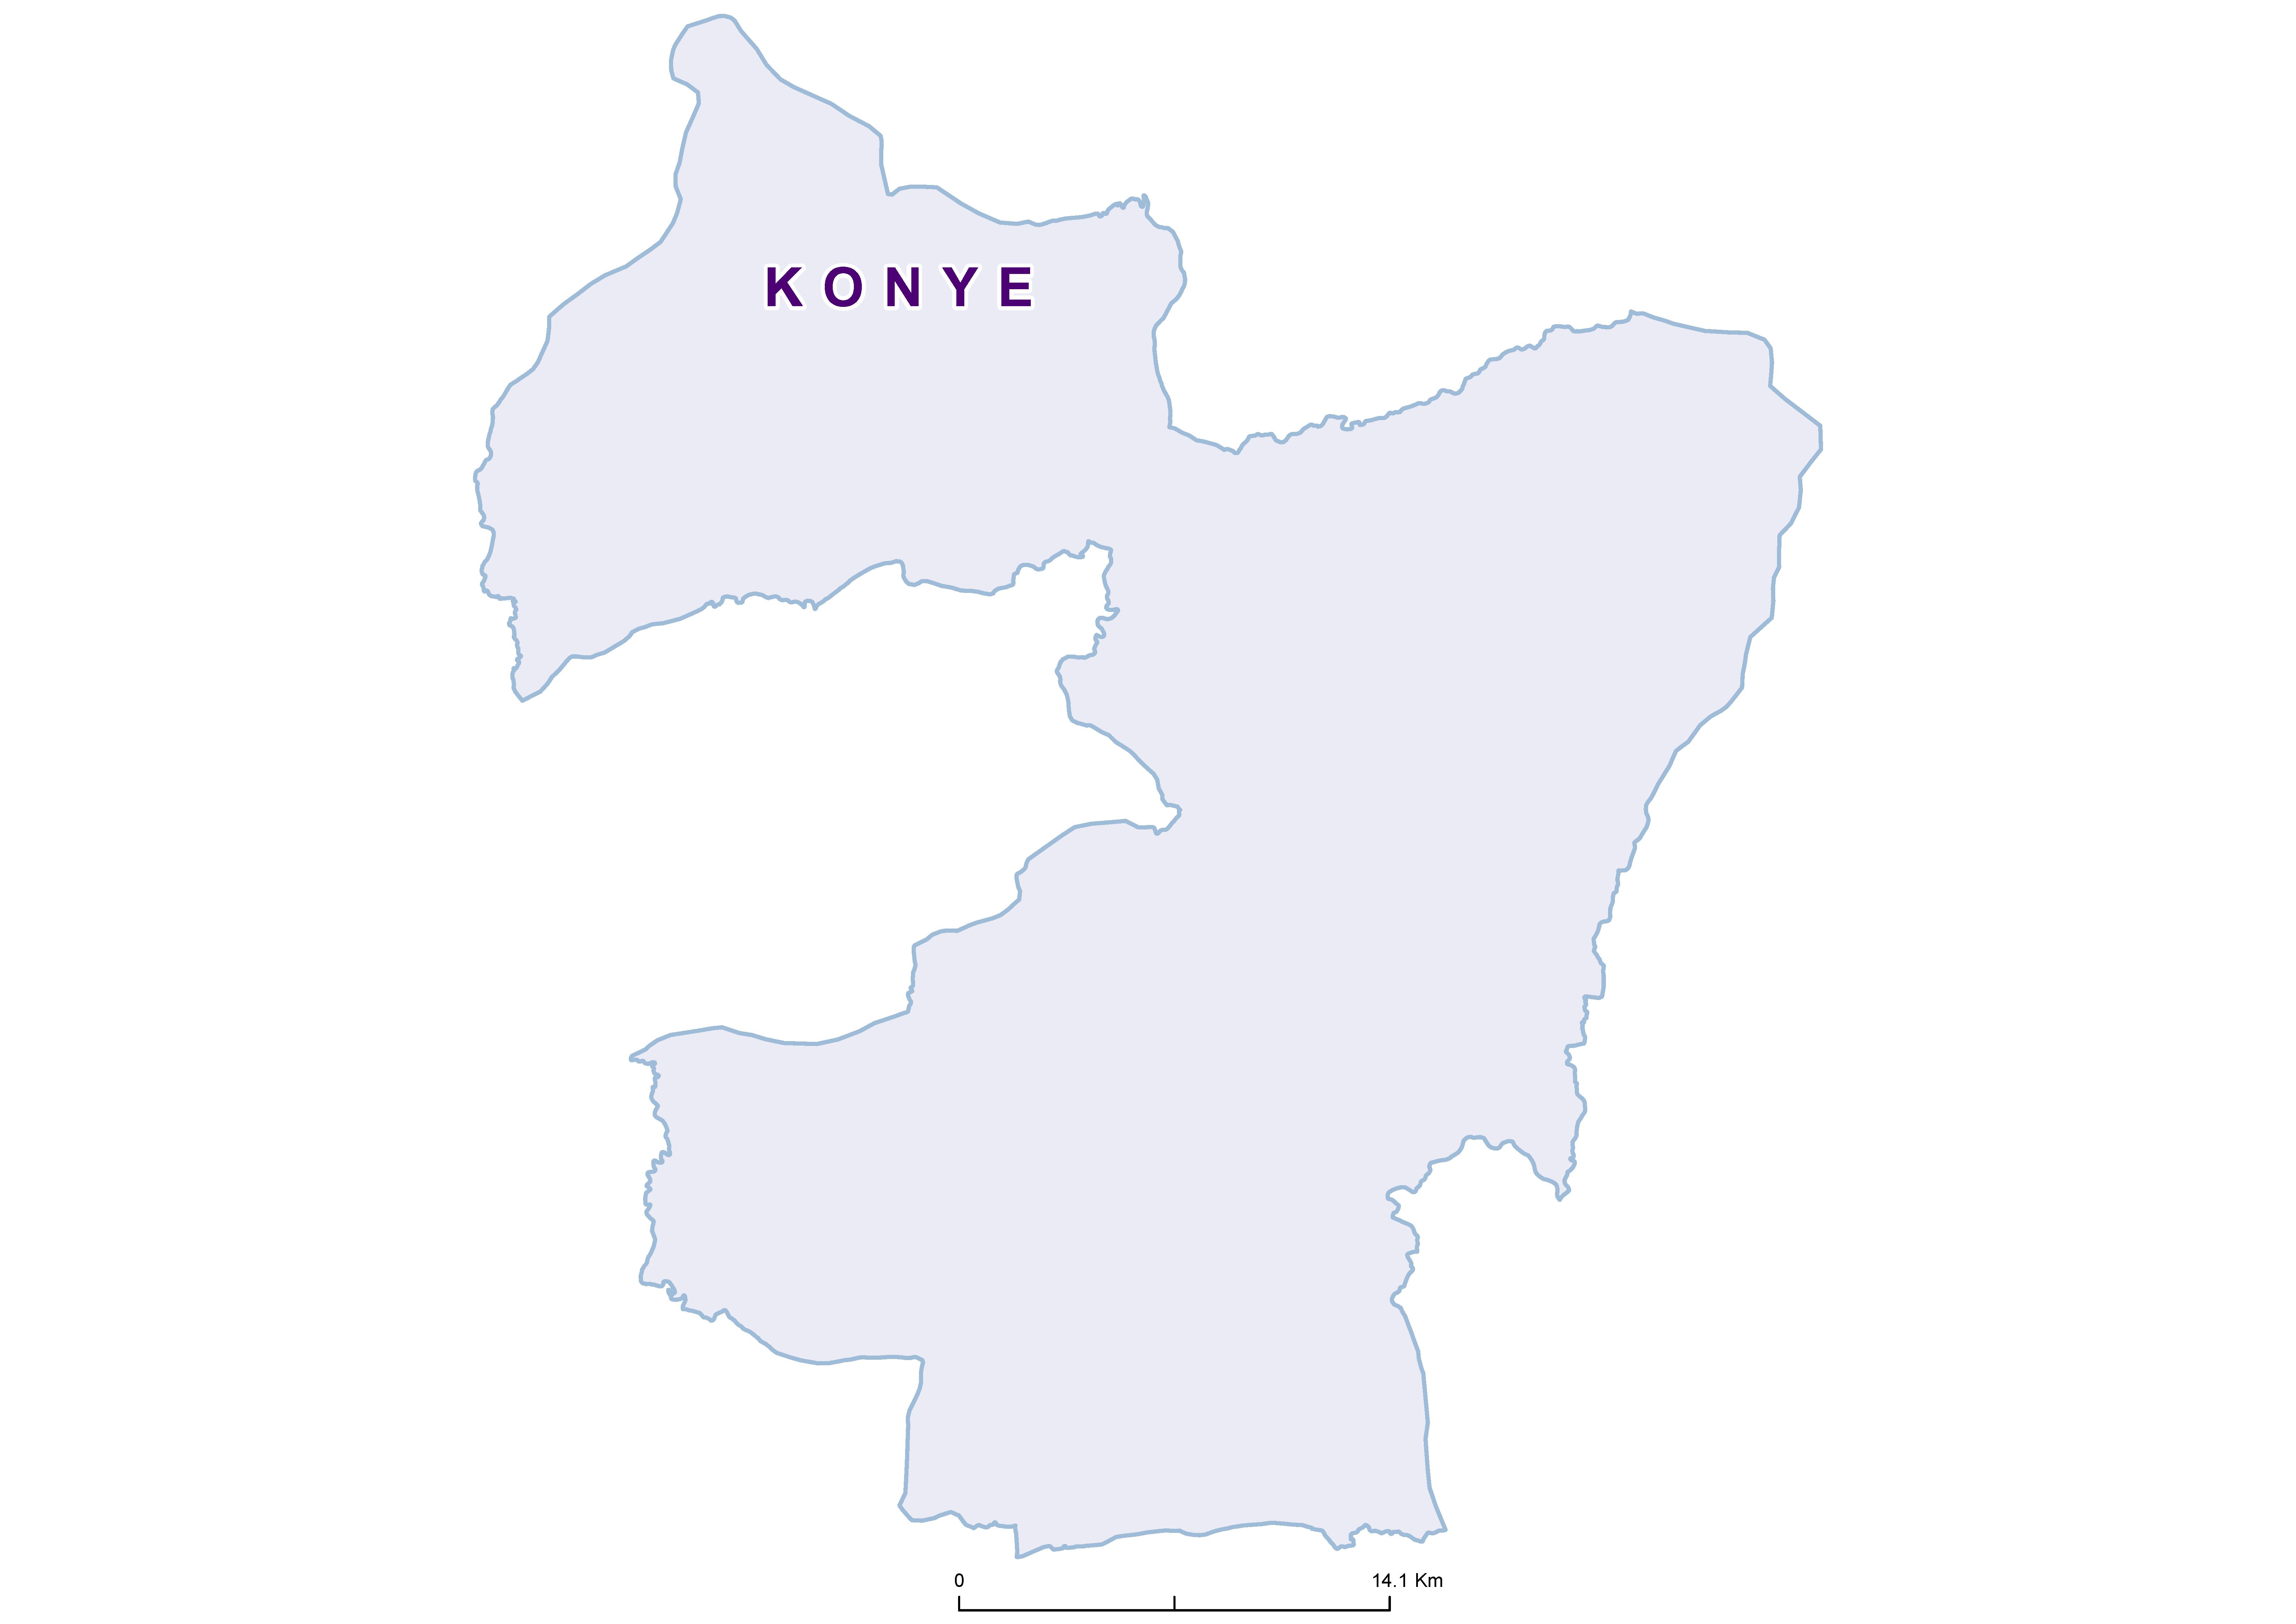 Konye Mean SCH 19850001